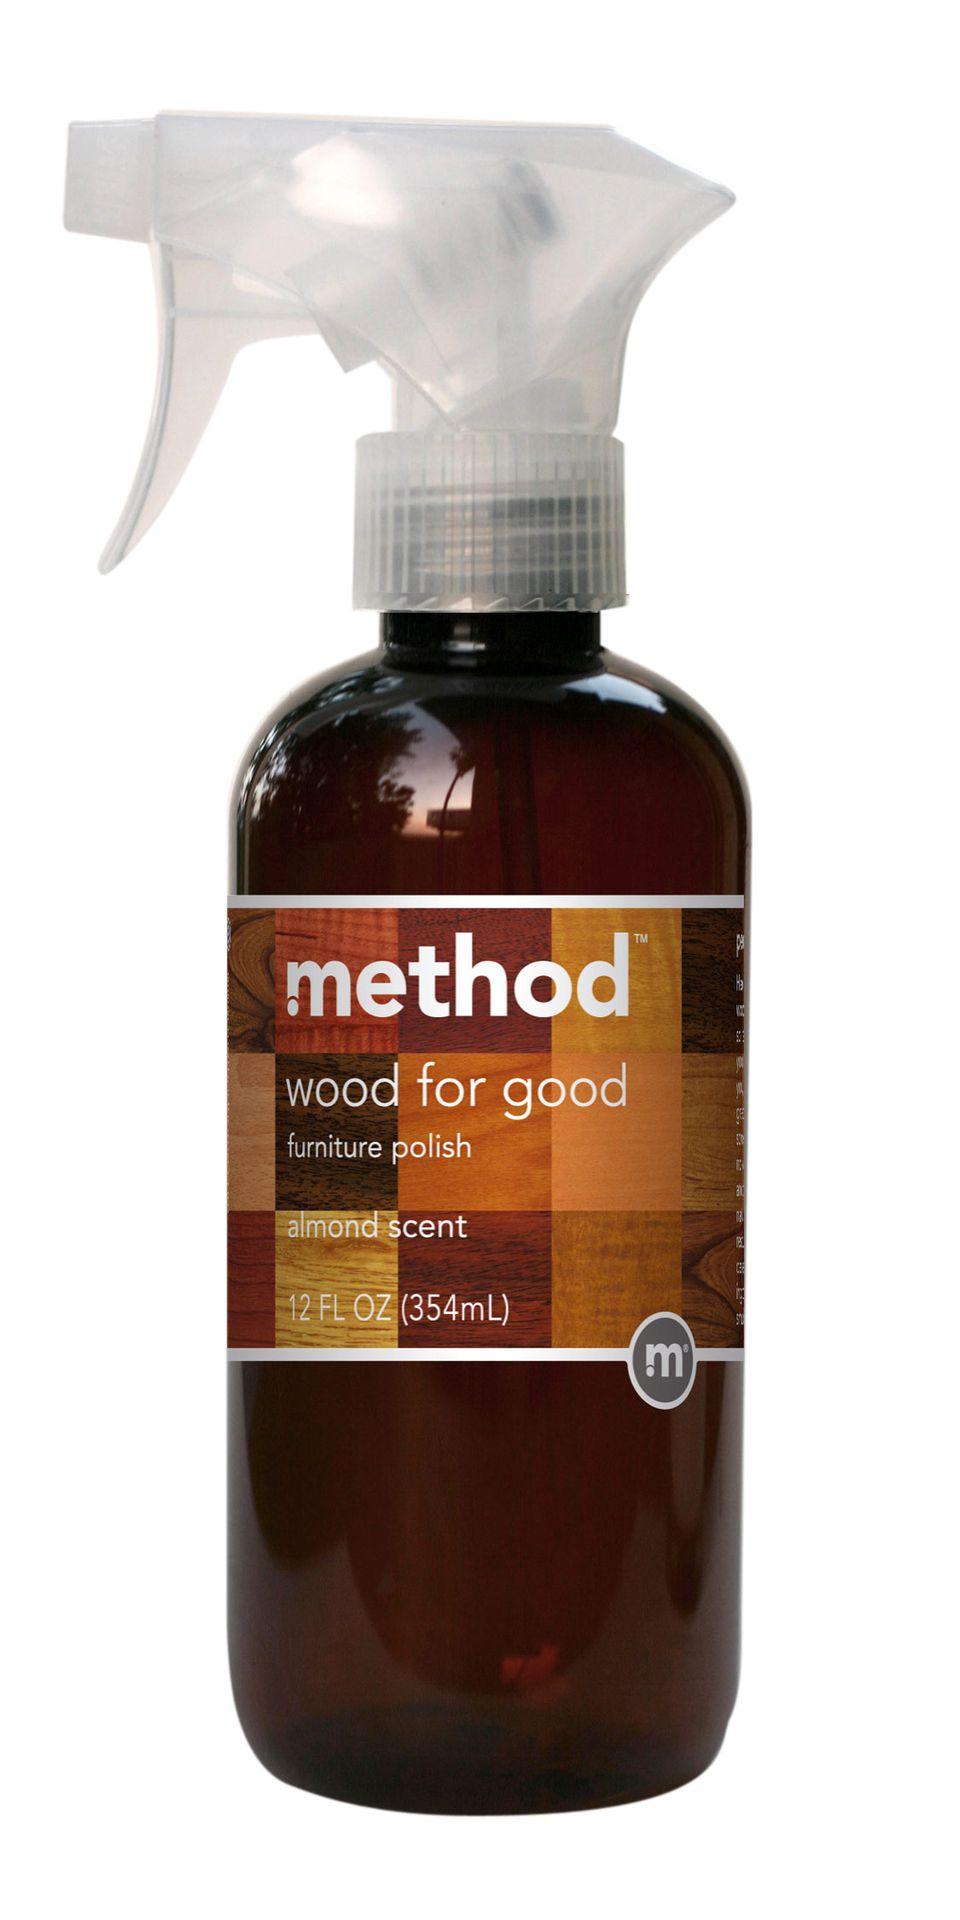 Method Wood For Good Furniture Polish